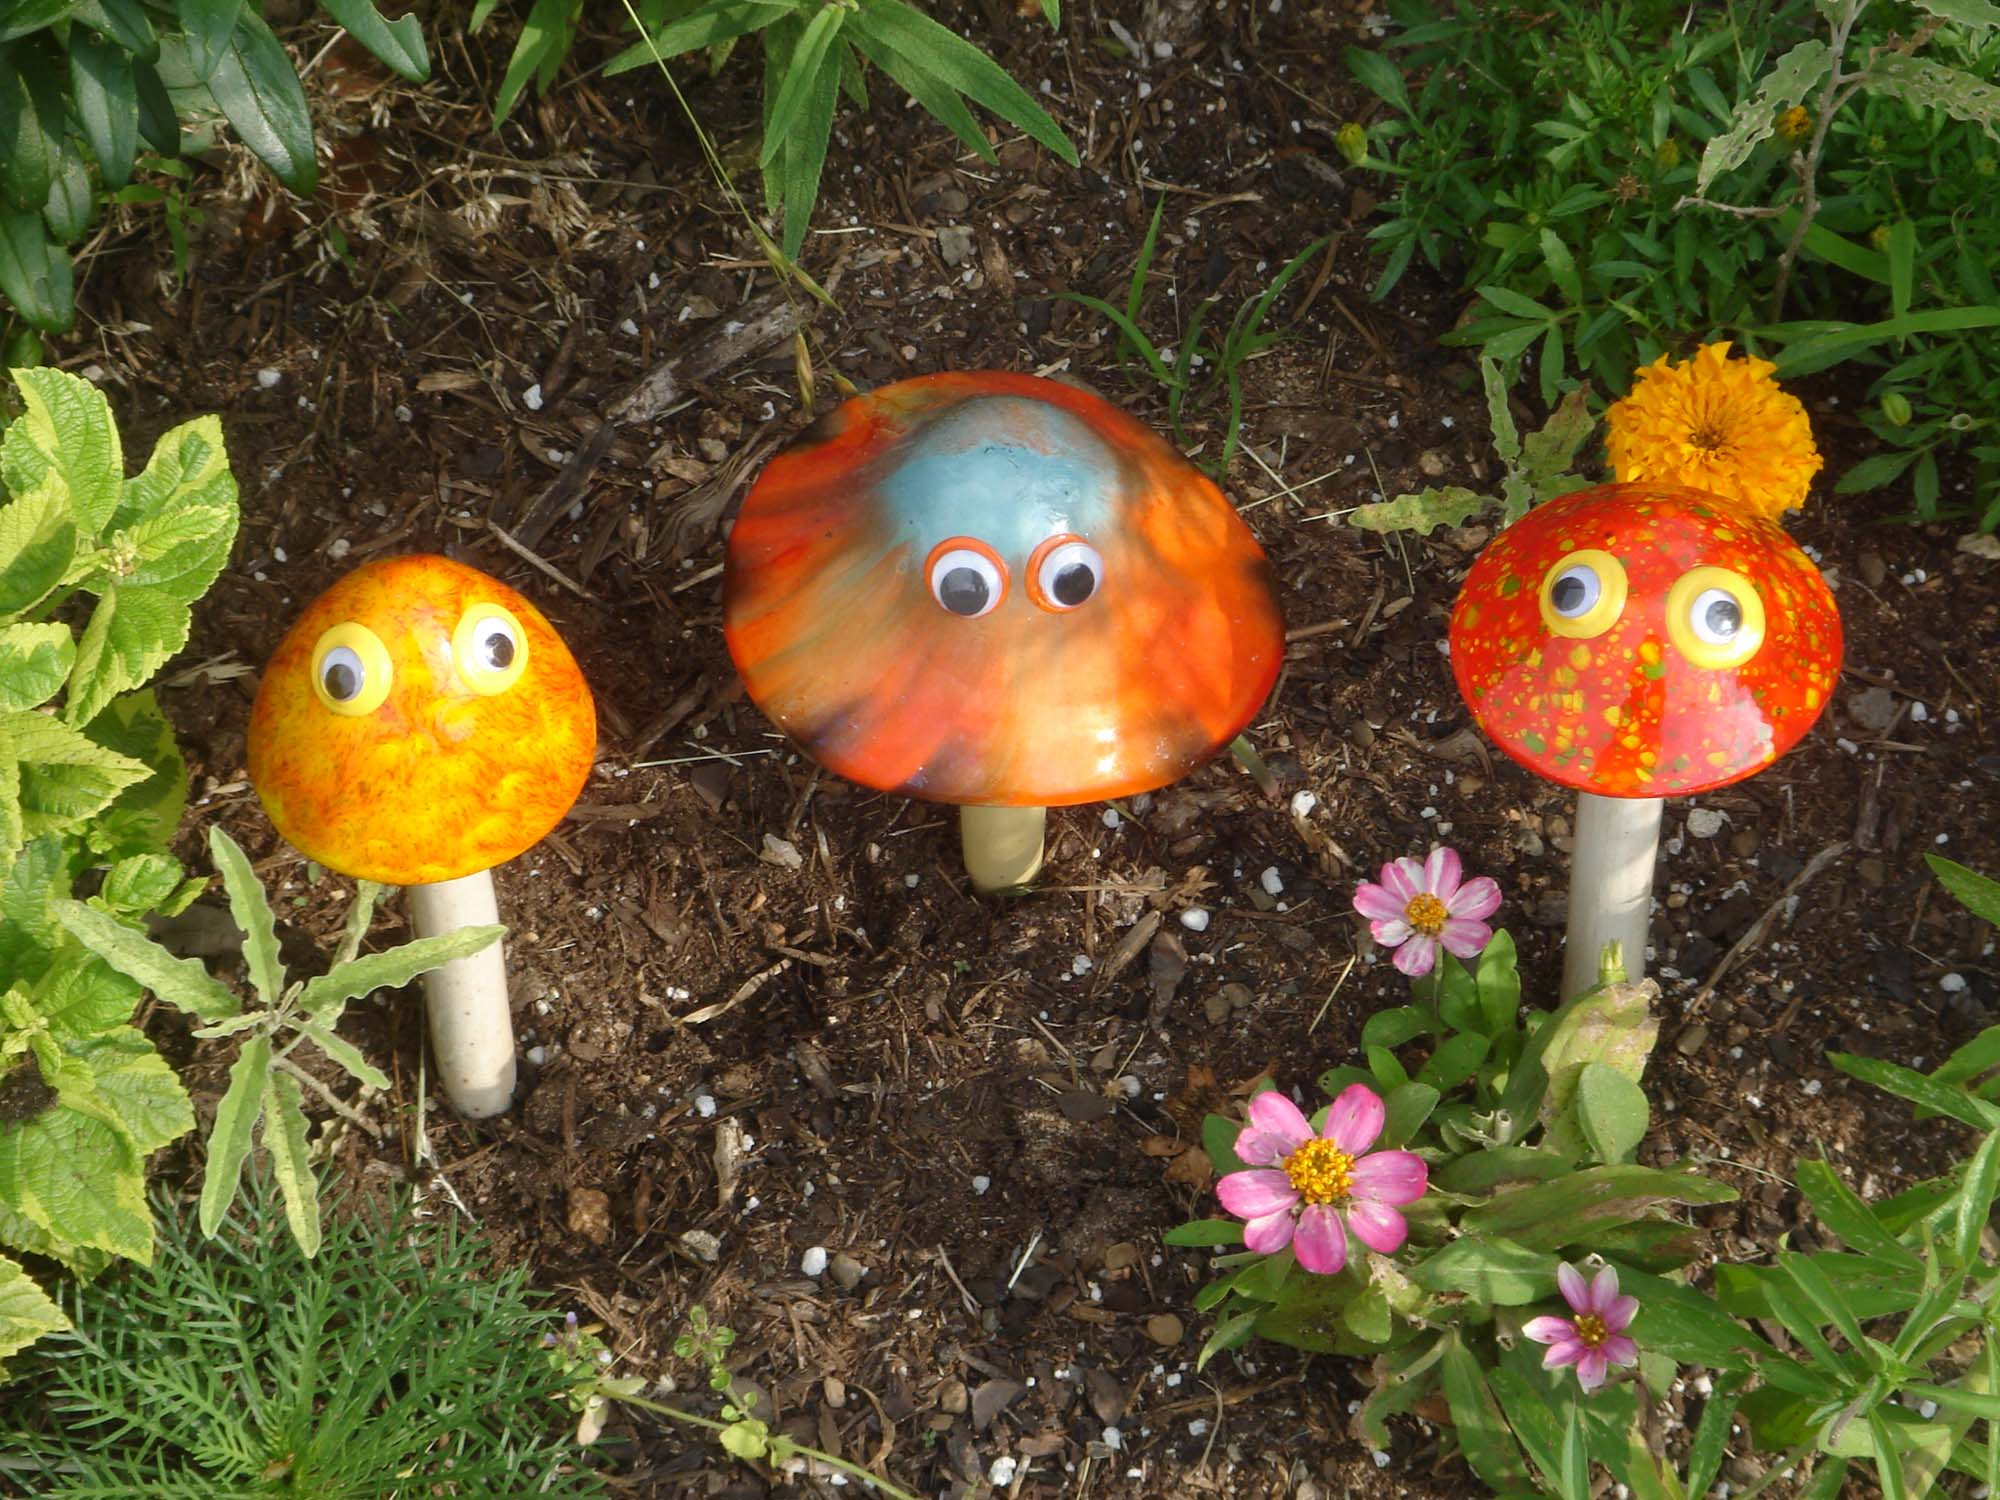 mushroomsgooglyfinal1500.jpg